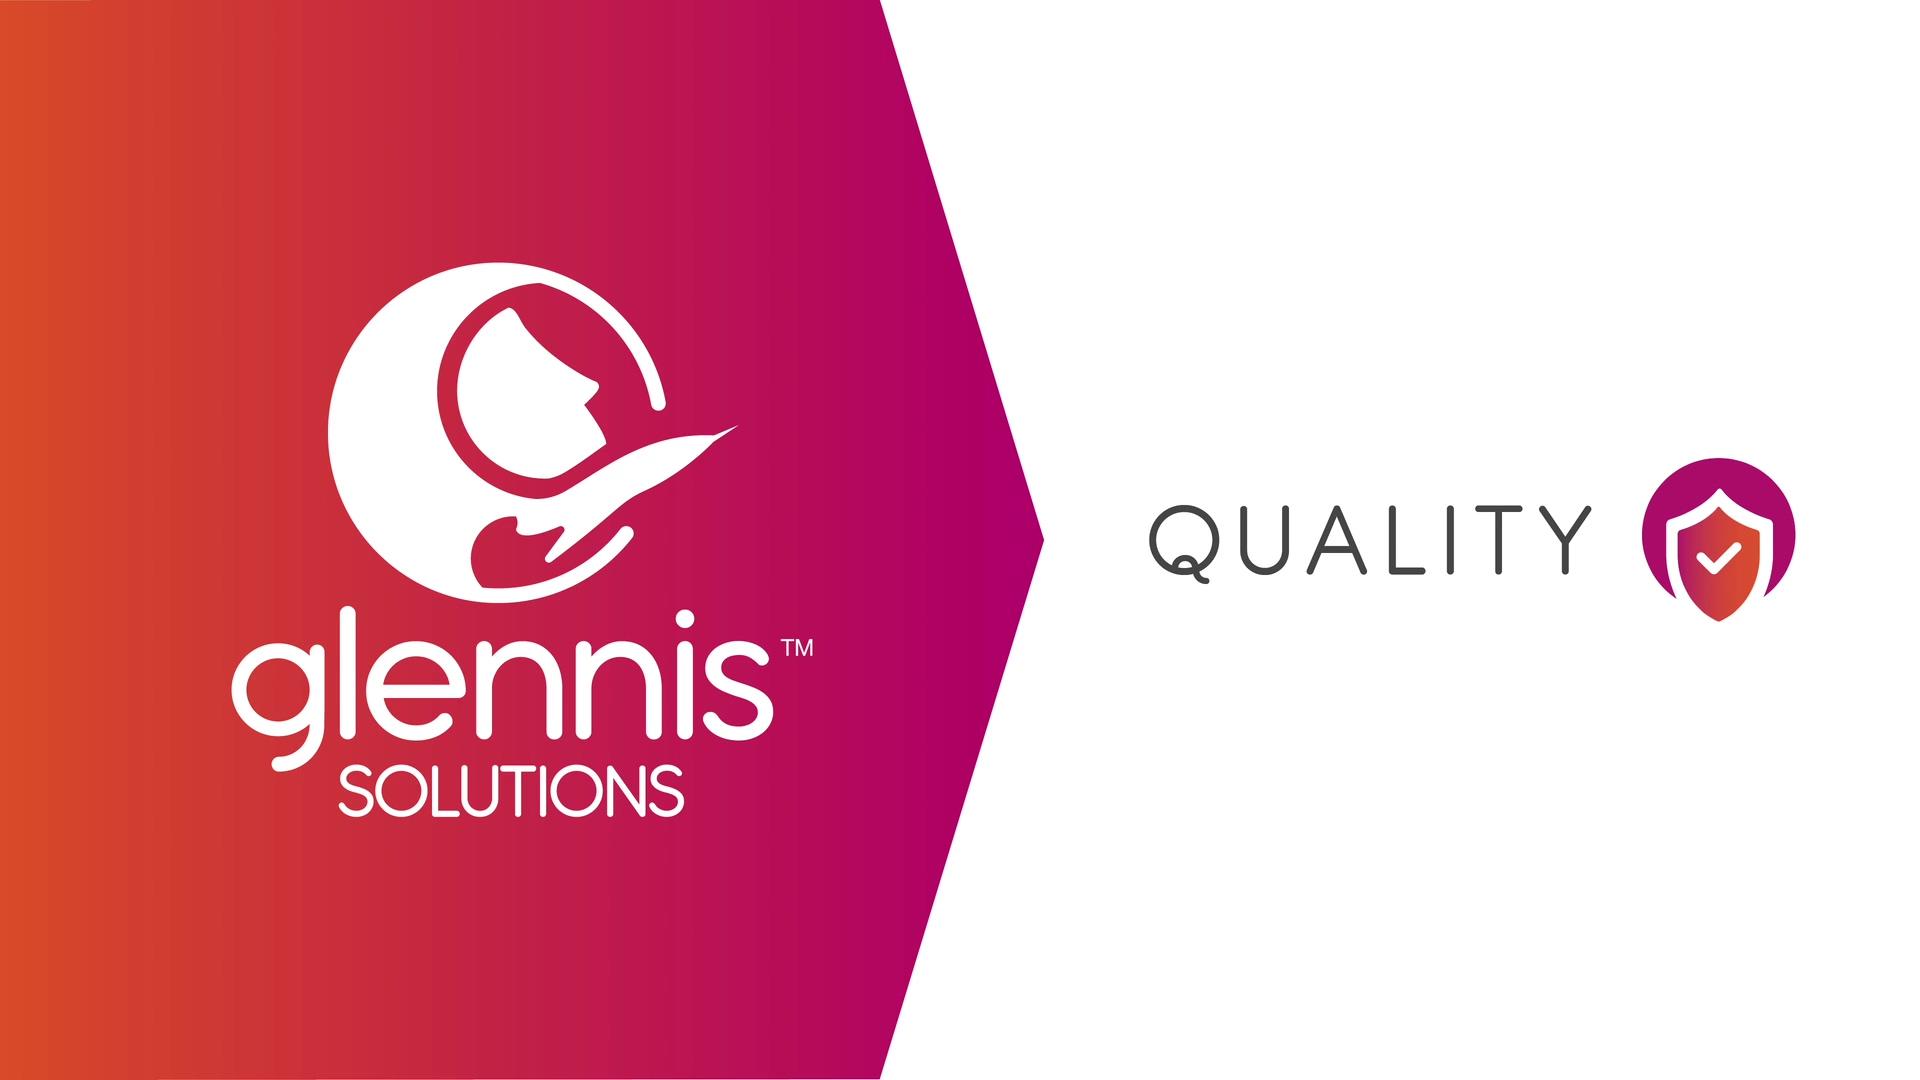 Glennis Quality